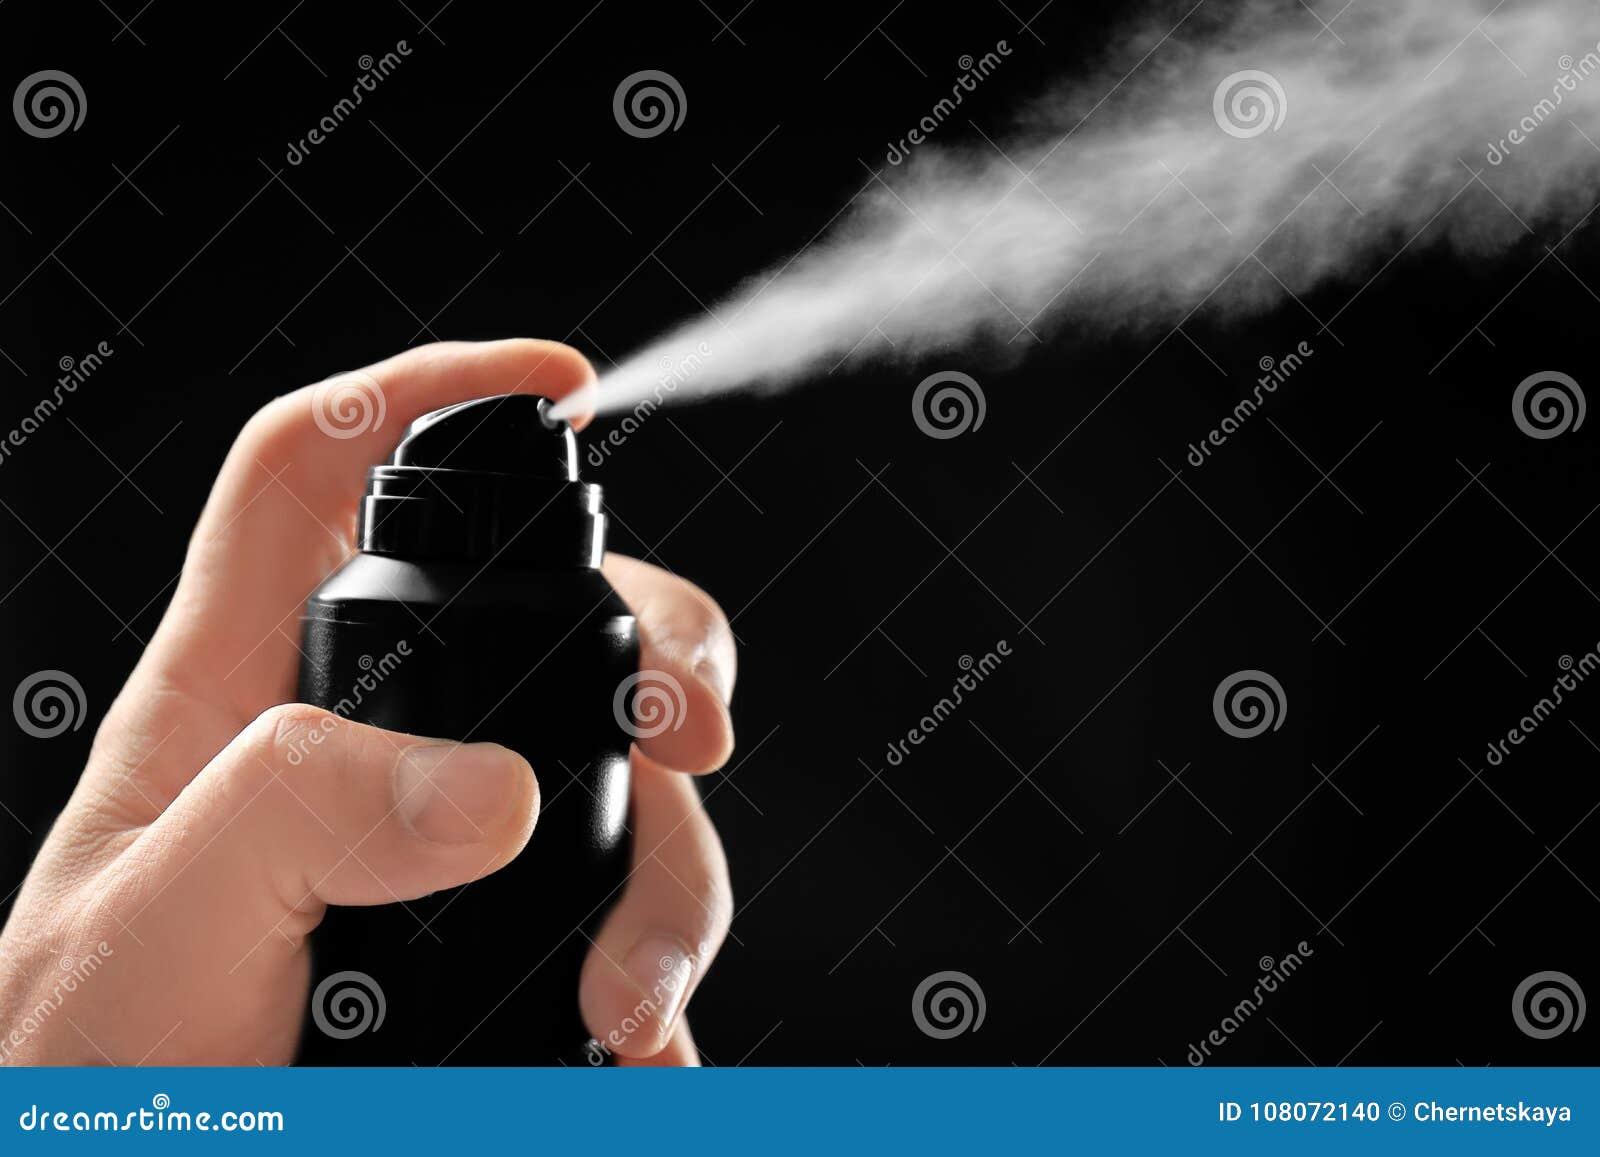 Man spraying deodorant on dark background,